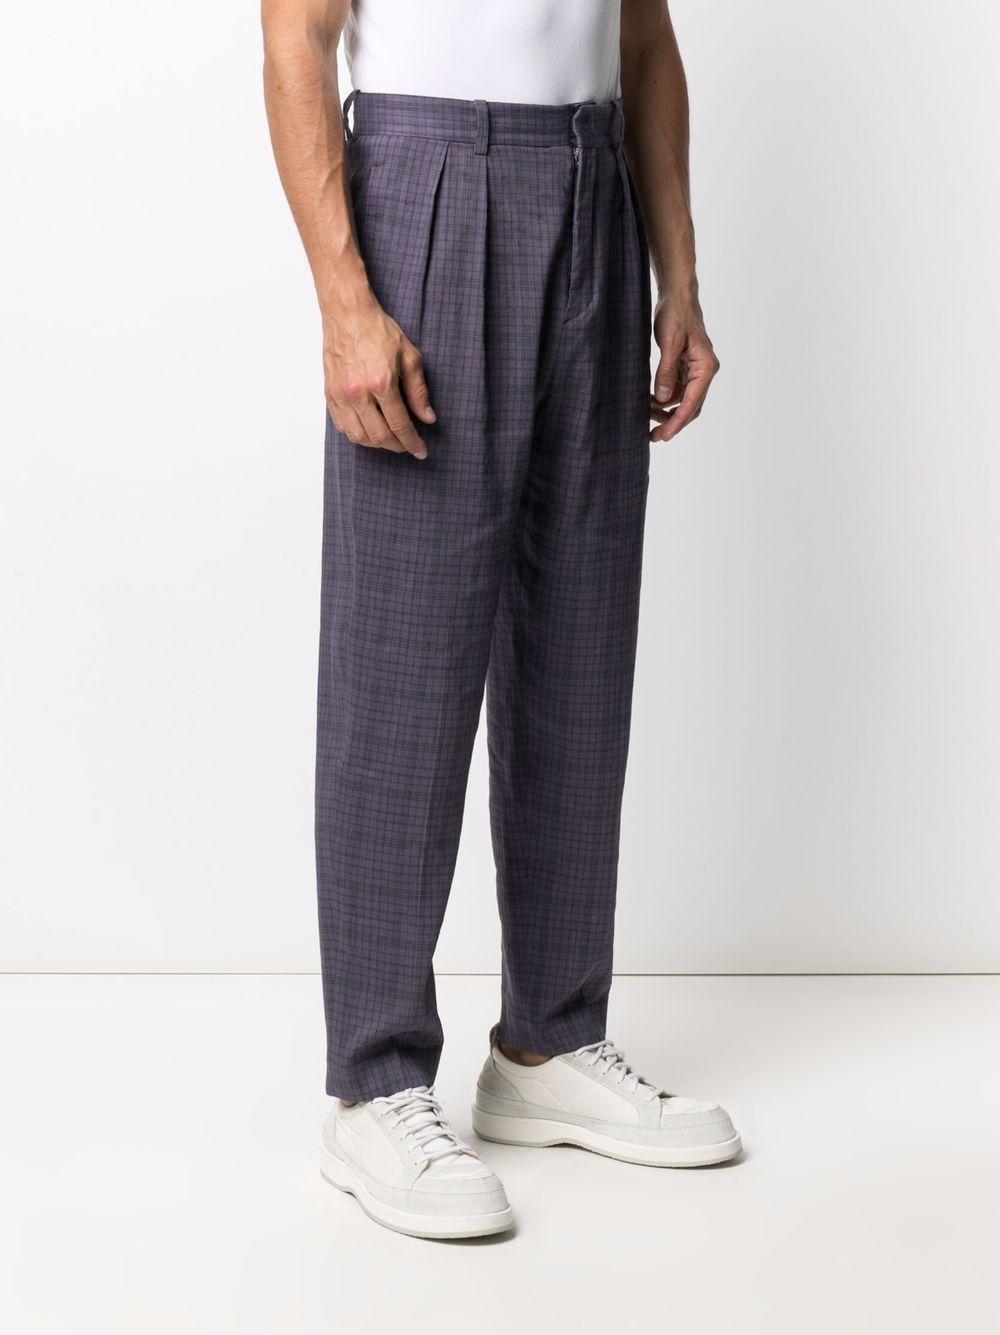 Pantaloni Nicklas Uomo ISABEL MARANT   Pantaloni   PA1100-21P012H30FN